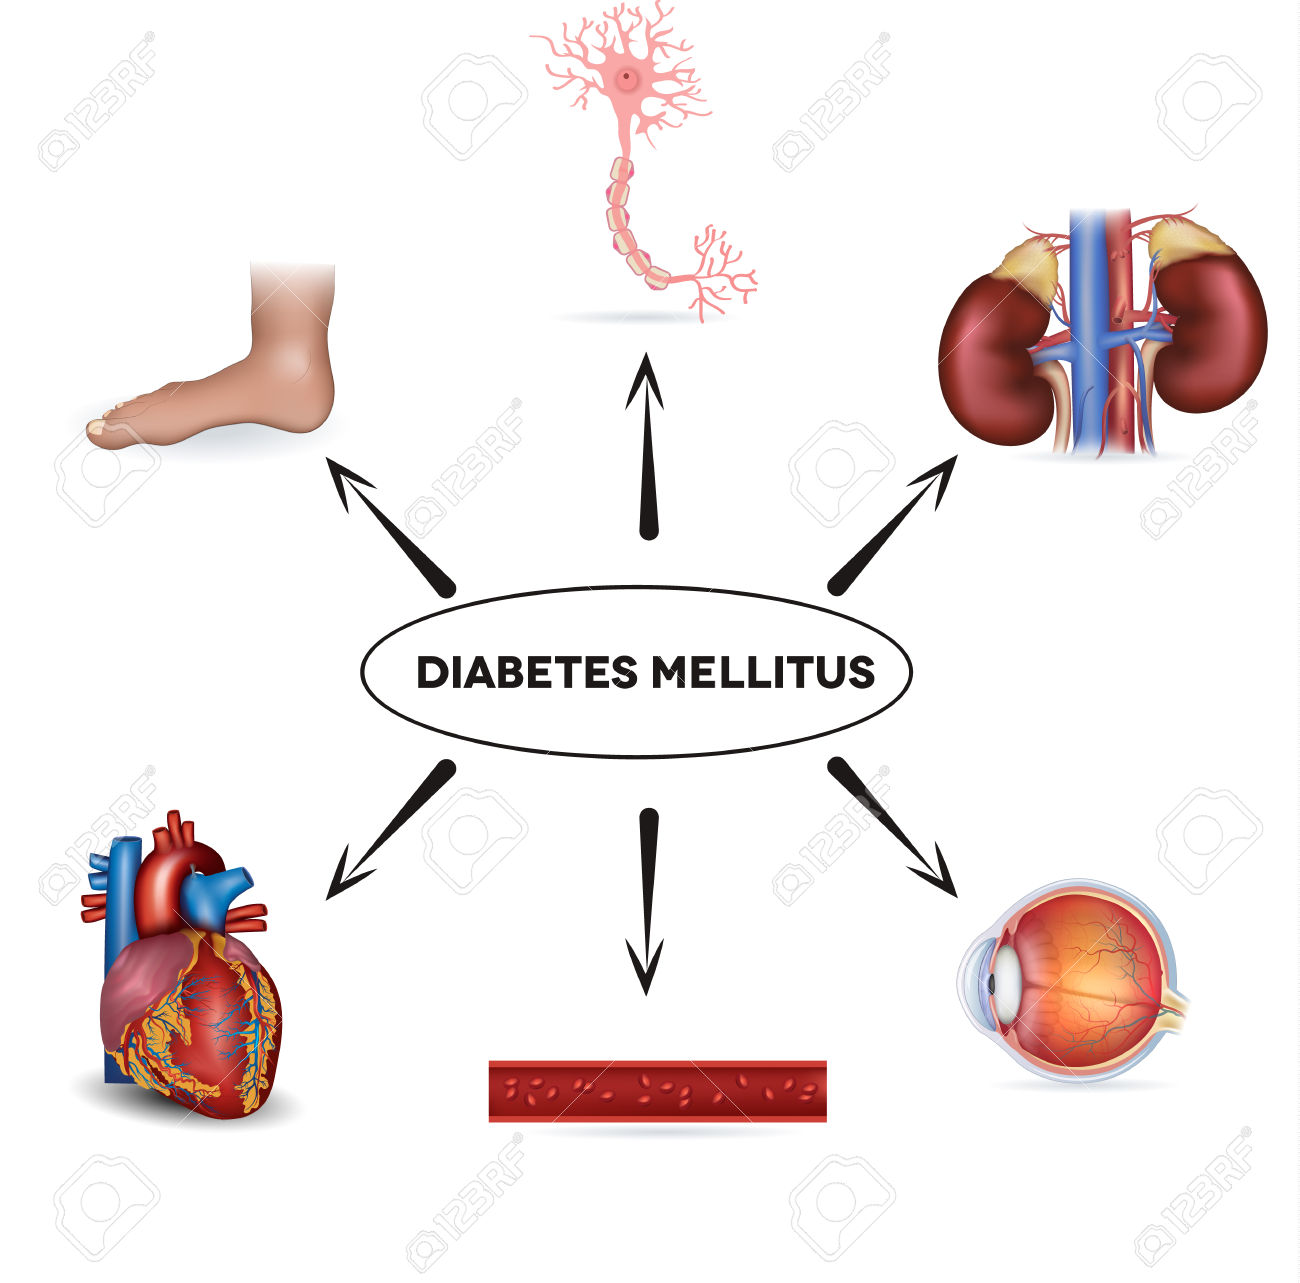 Diabetes Mellitus Affected Areas Diabetes Affects Nerves, Kidneys.